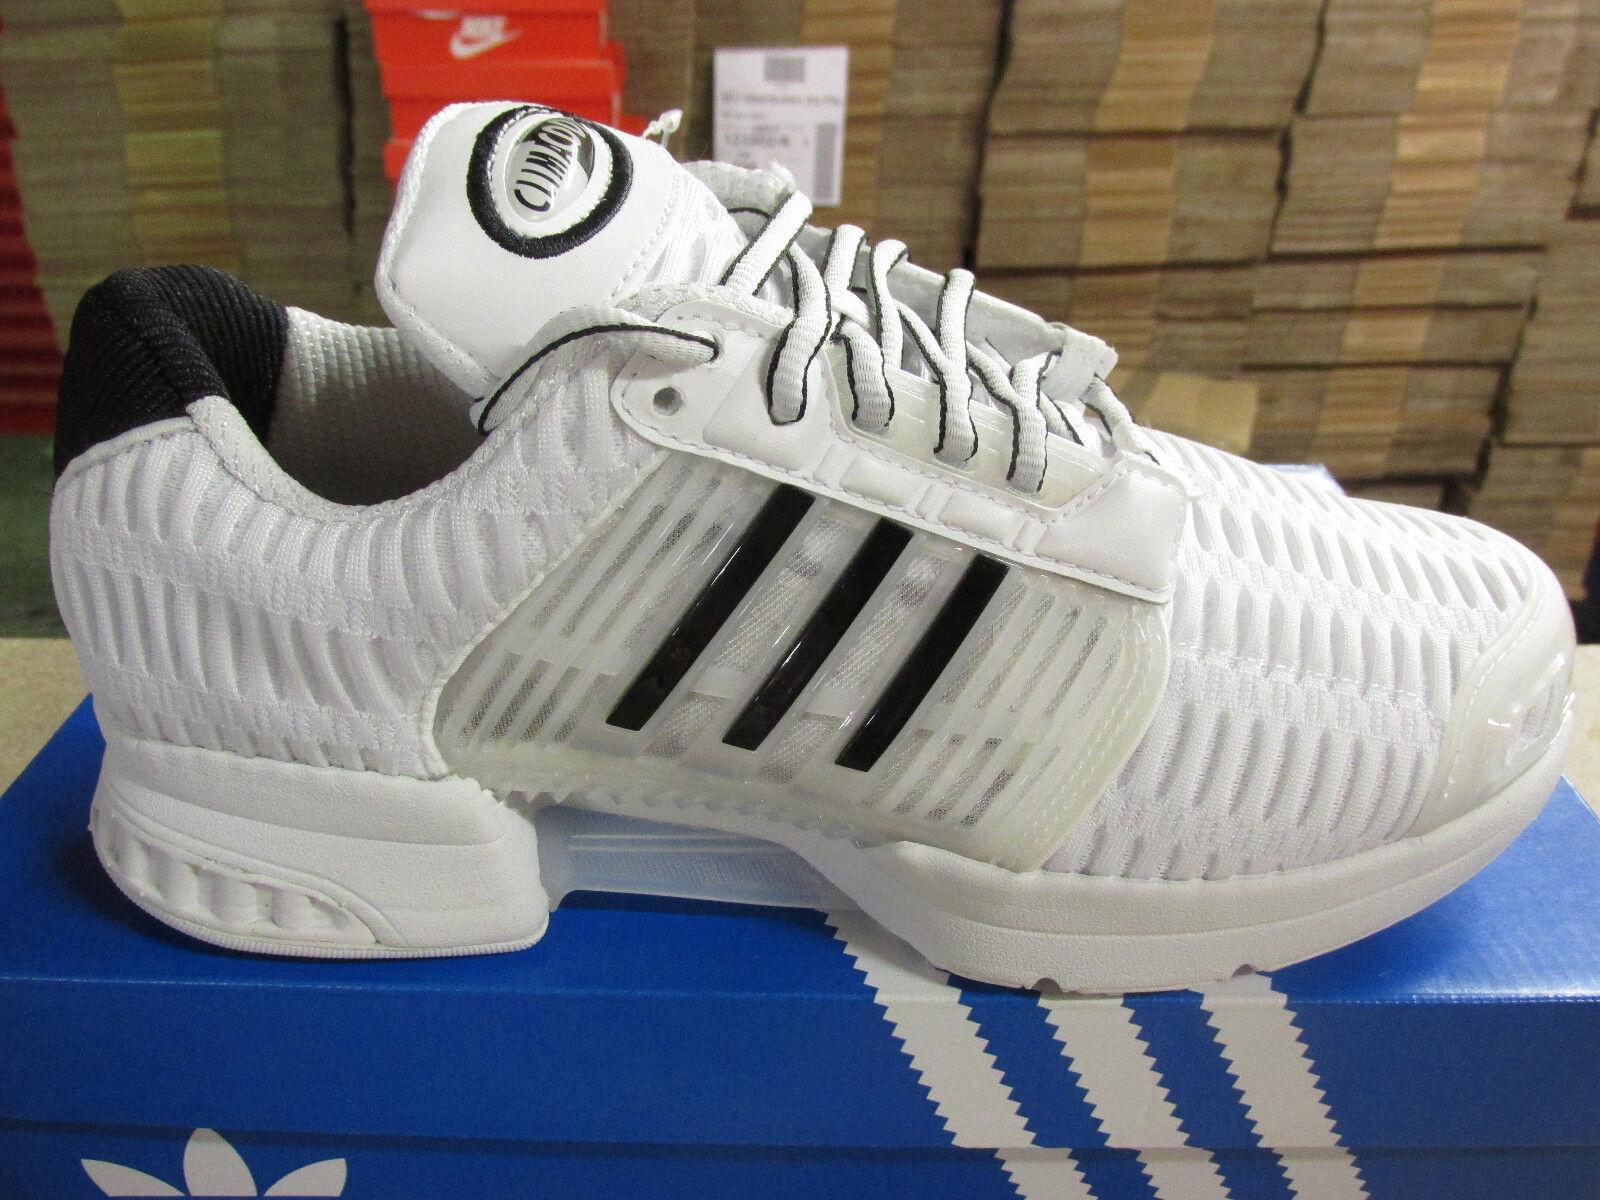 Adidas Originali Clima Cool 1 da Uomo da Corsa BB0671 Sautope da Ginnastica Sautope classeiche da uomo